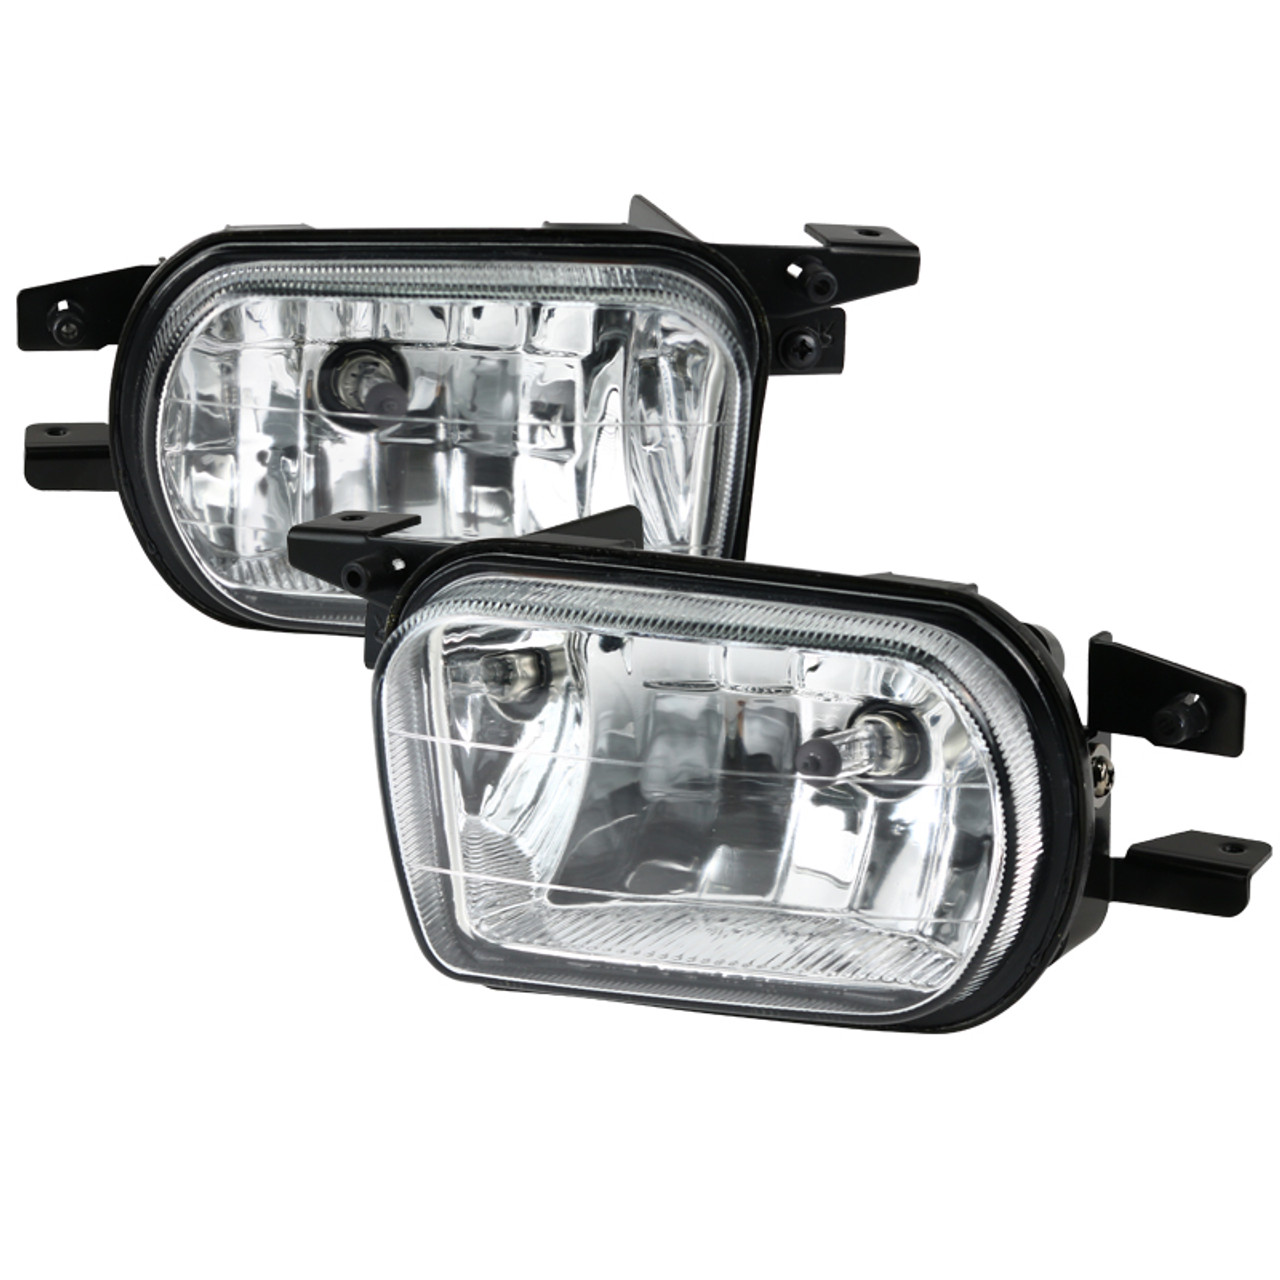 OE Replacement Fog Light Lens//Housing MERCEDES CL500 2001-2004